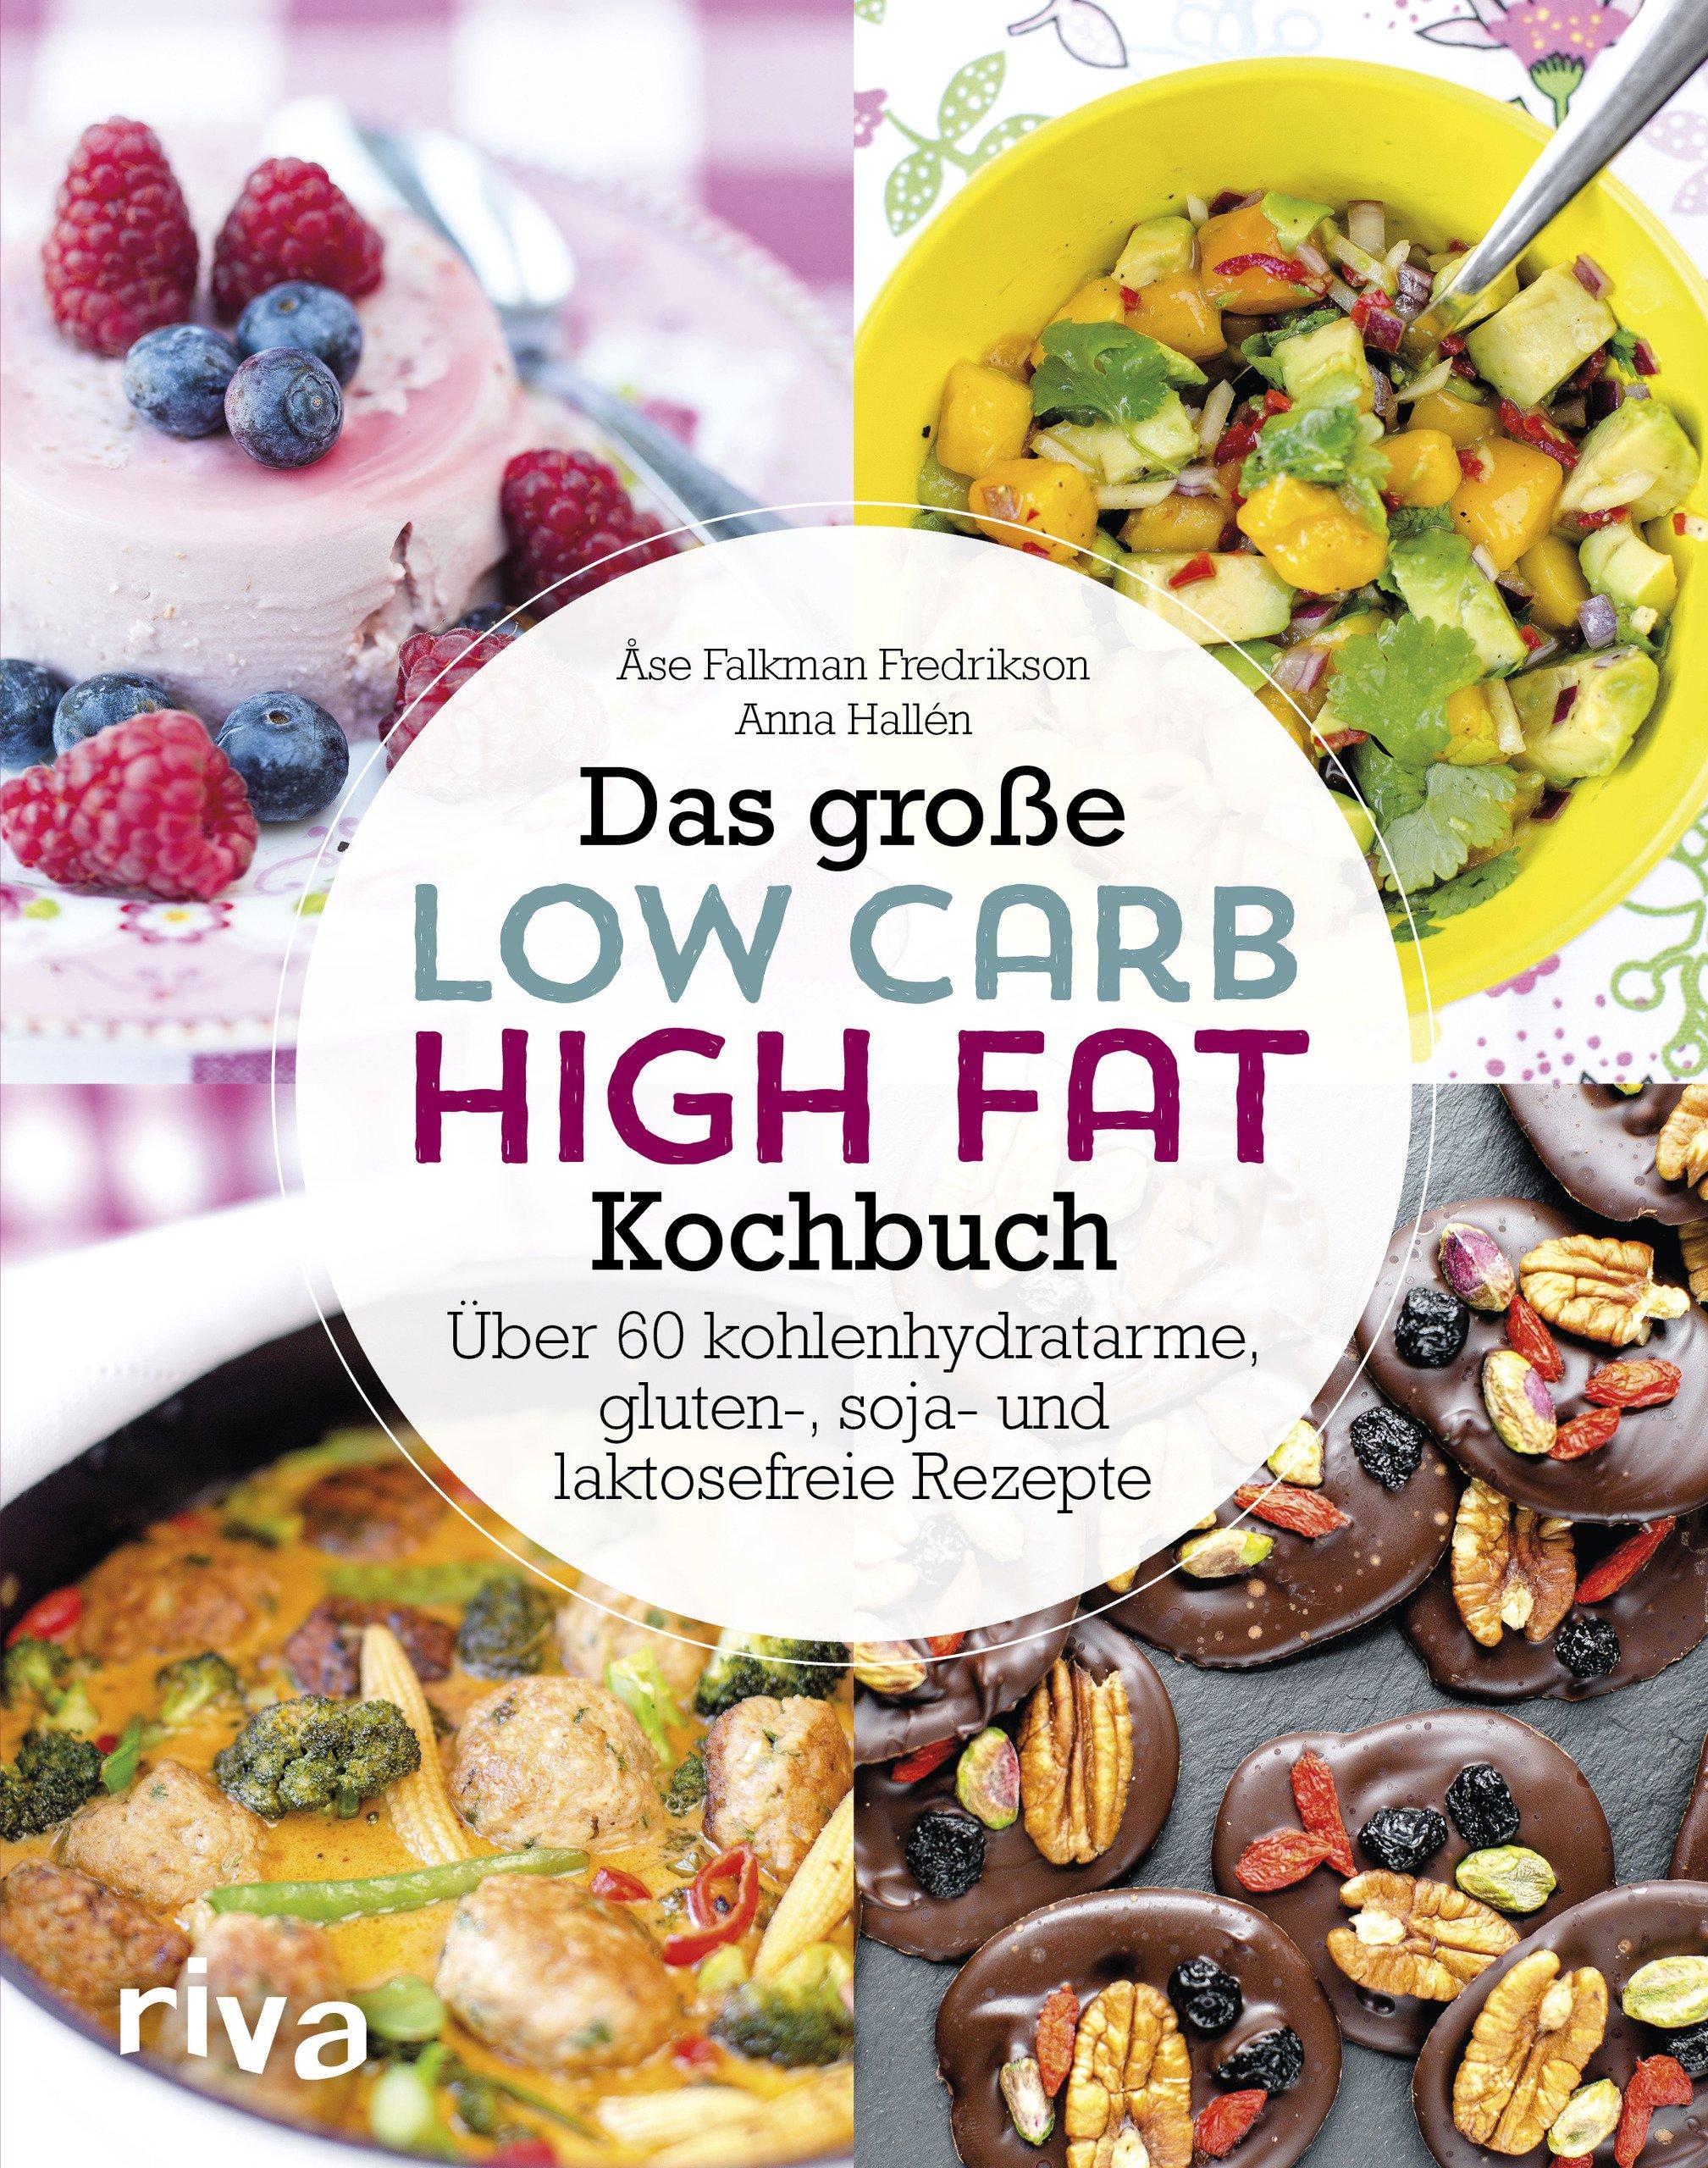 Ketogenes Diätbuch für Anfänger pdf